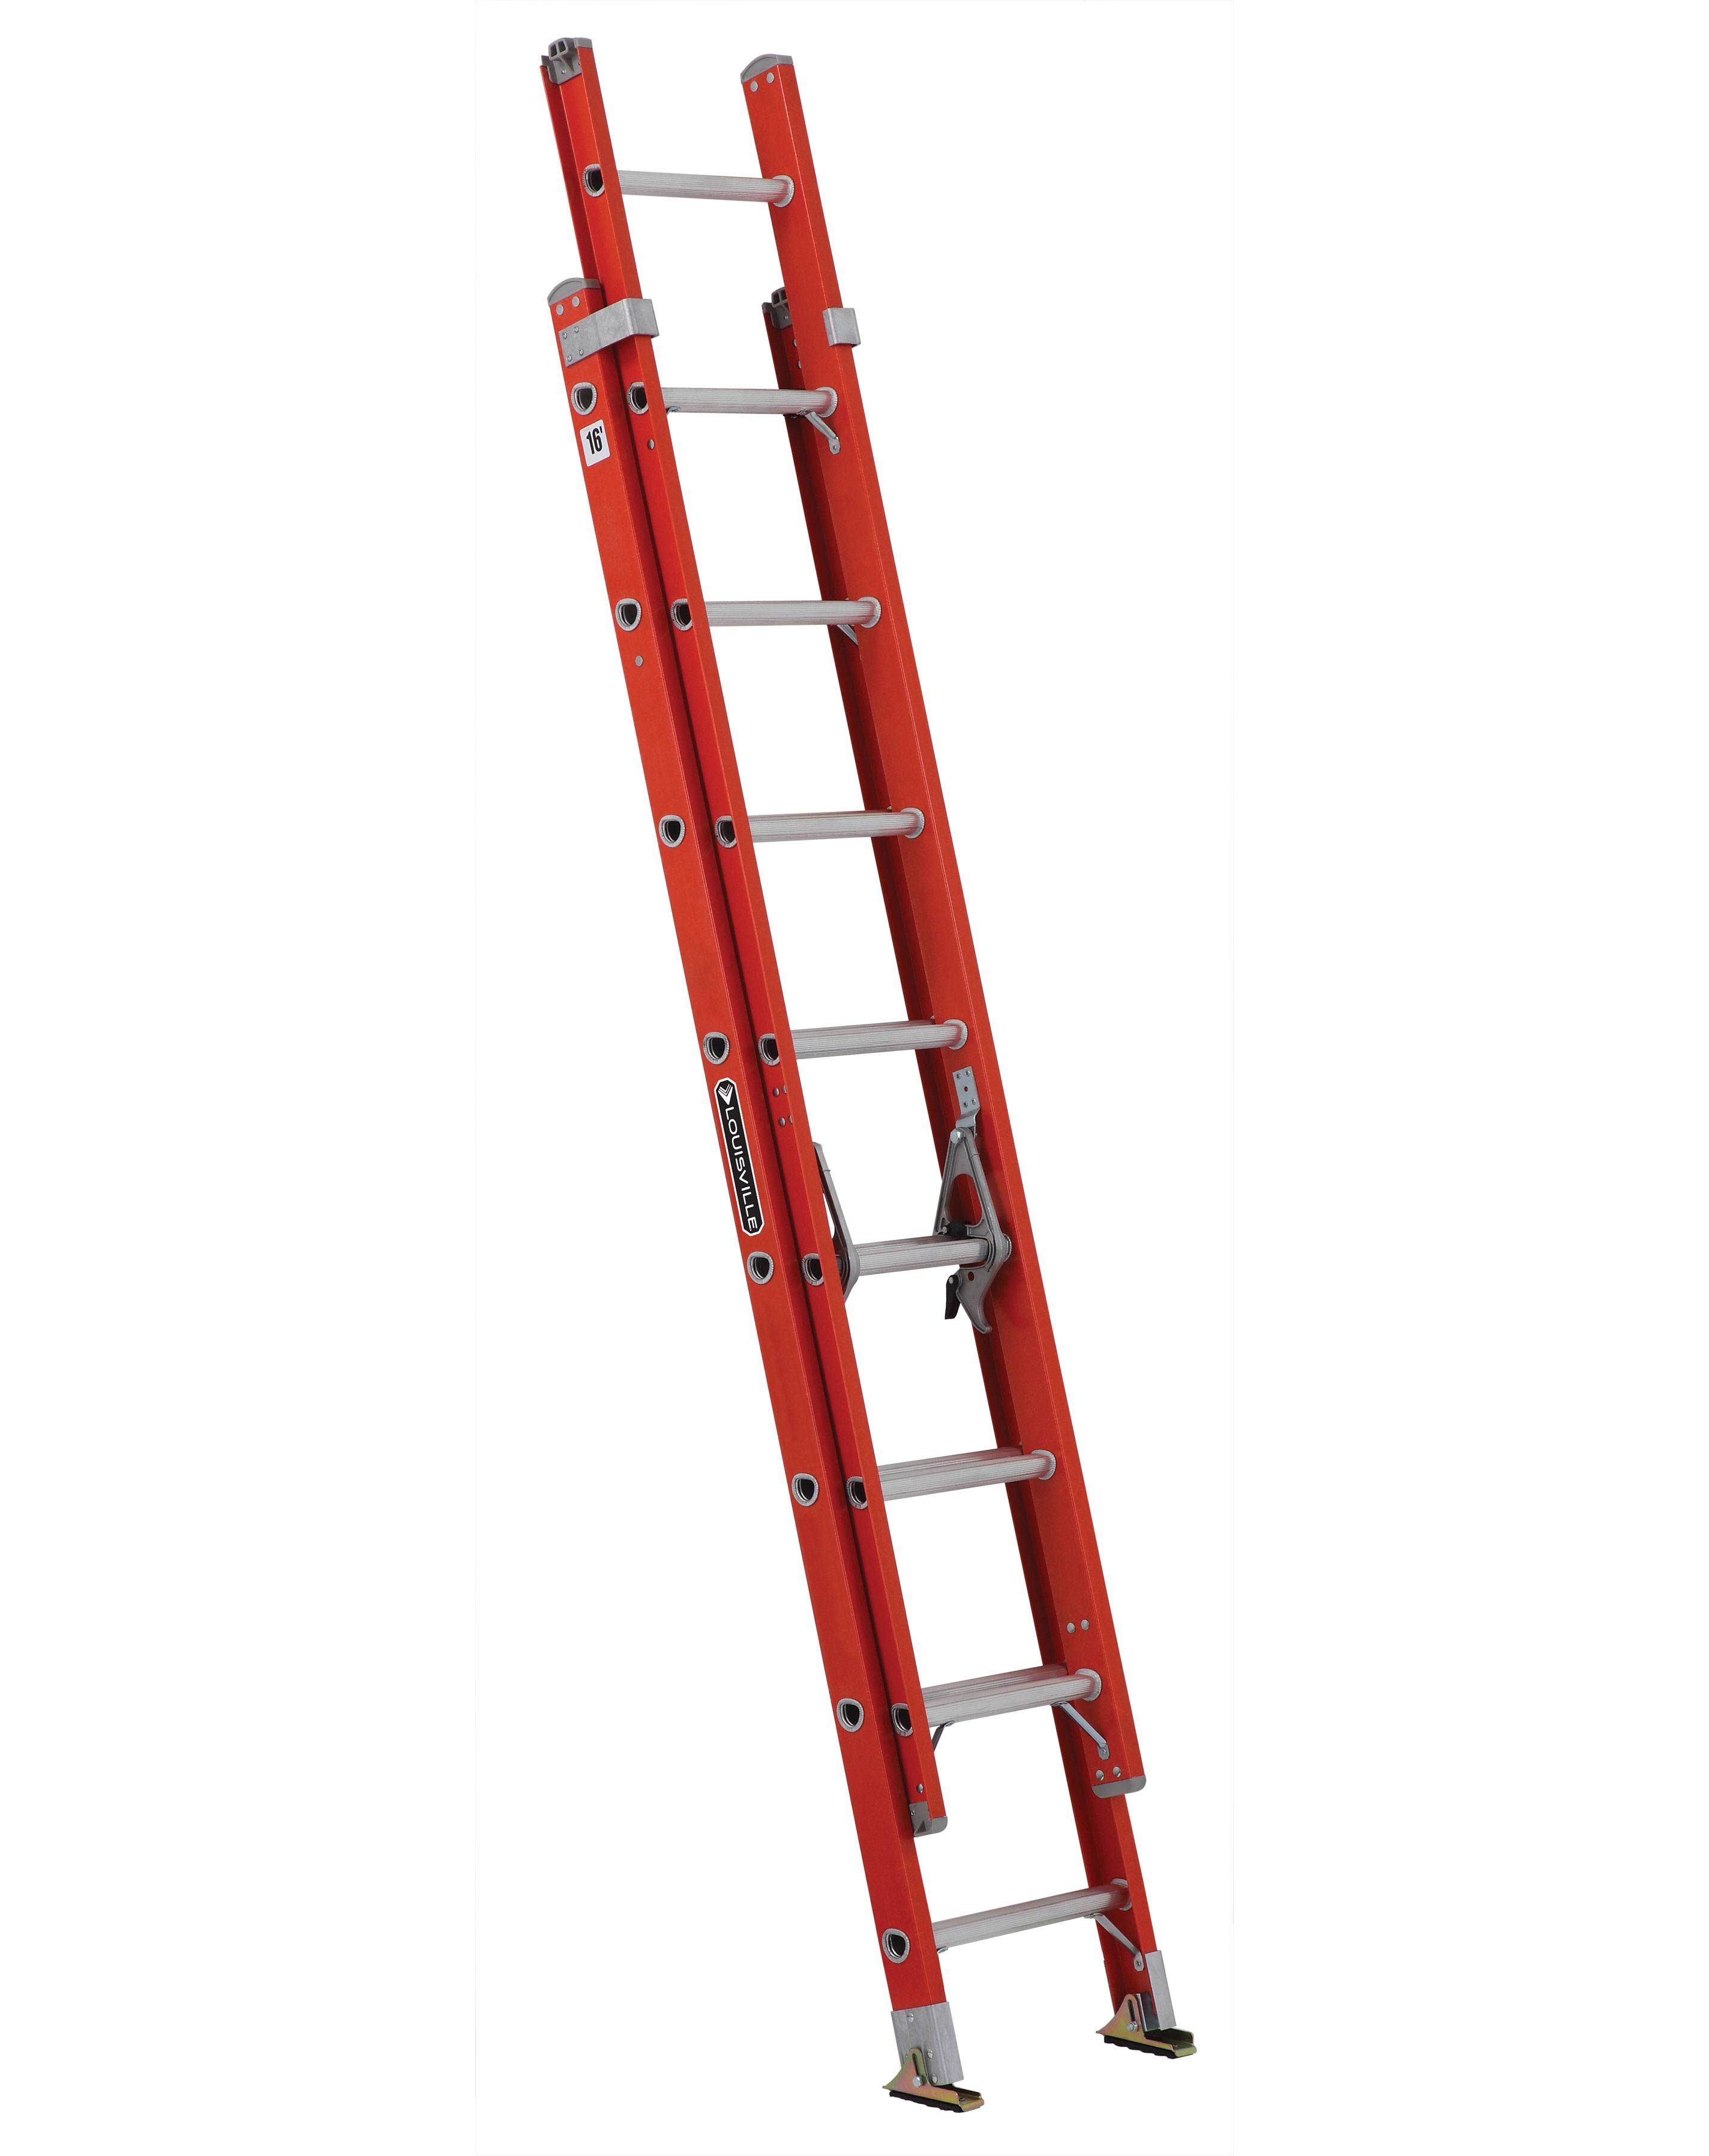 Louisville Ladder FE3216 16ft Fiberglass Extension Ladder, 300lb Load Capacity